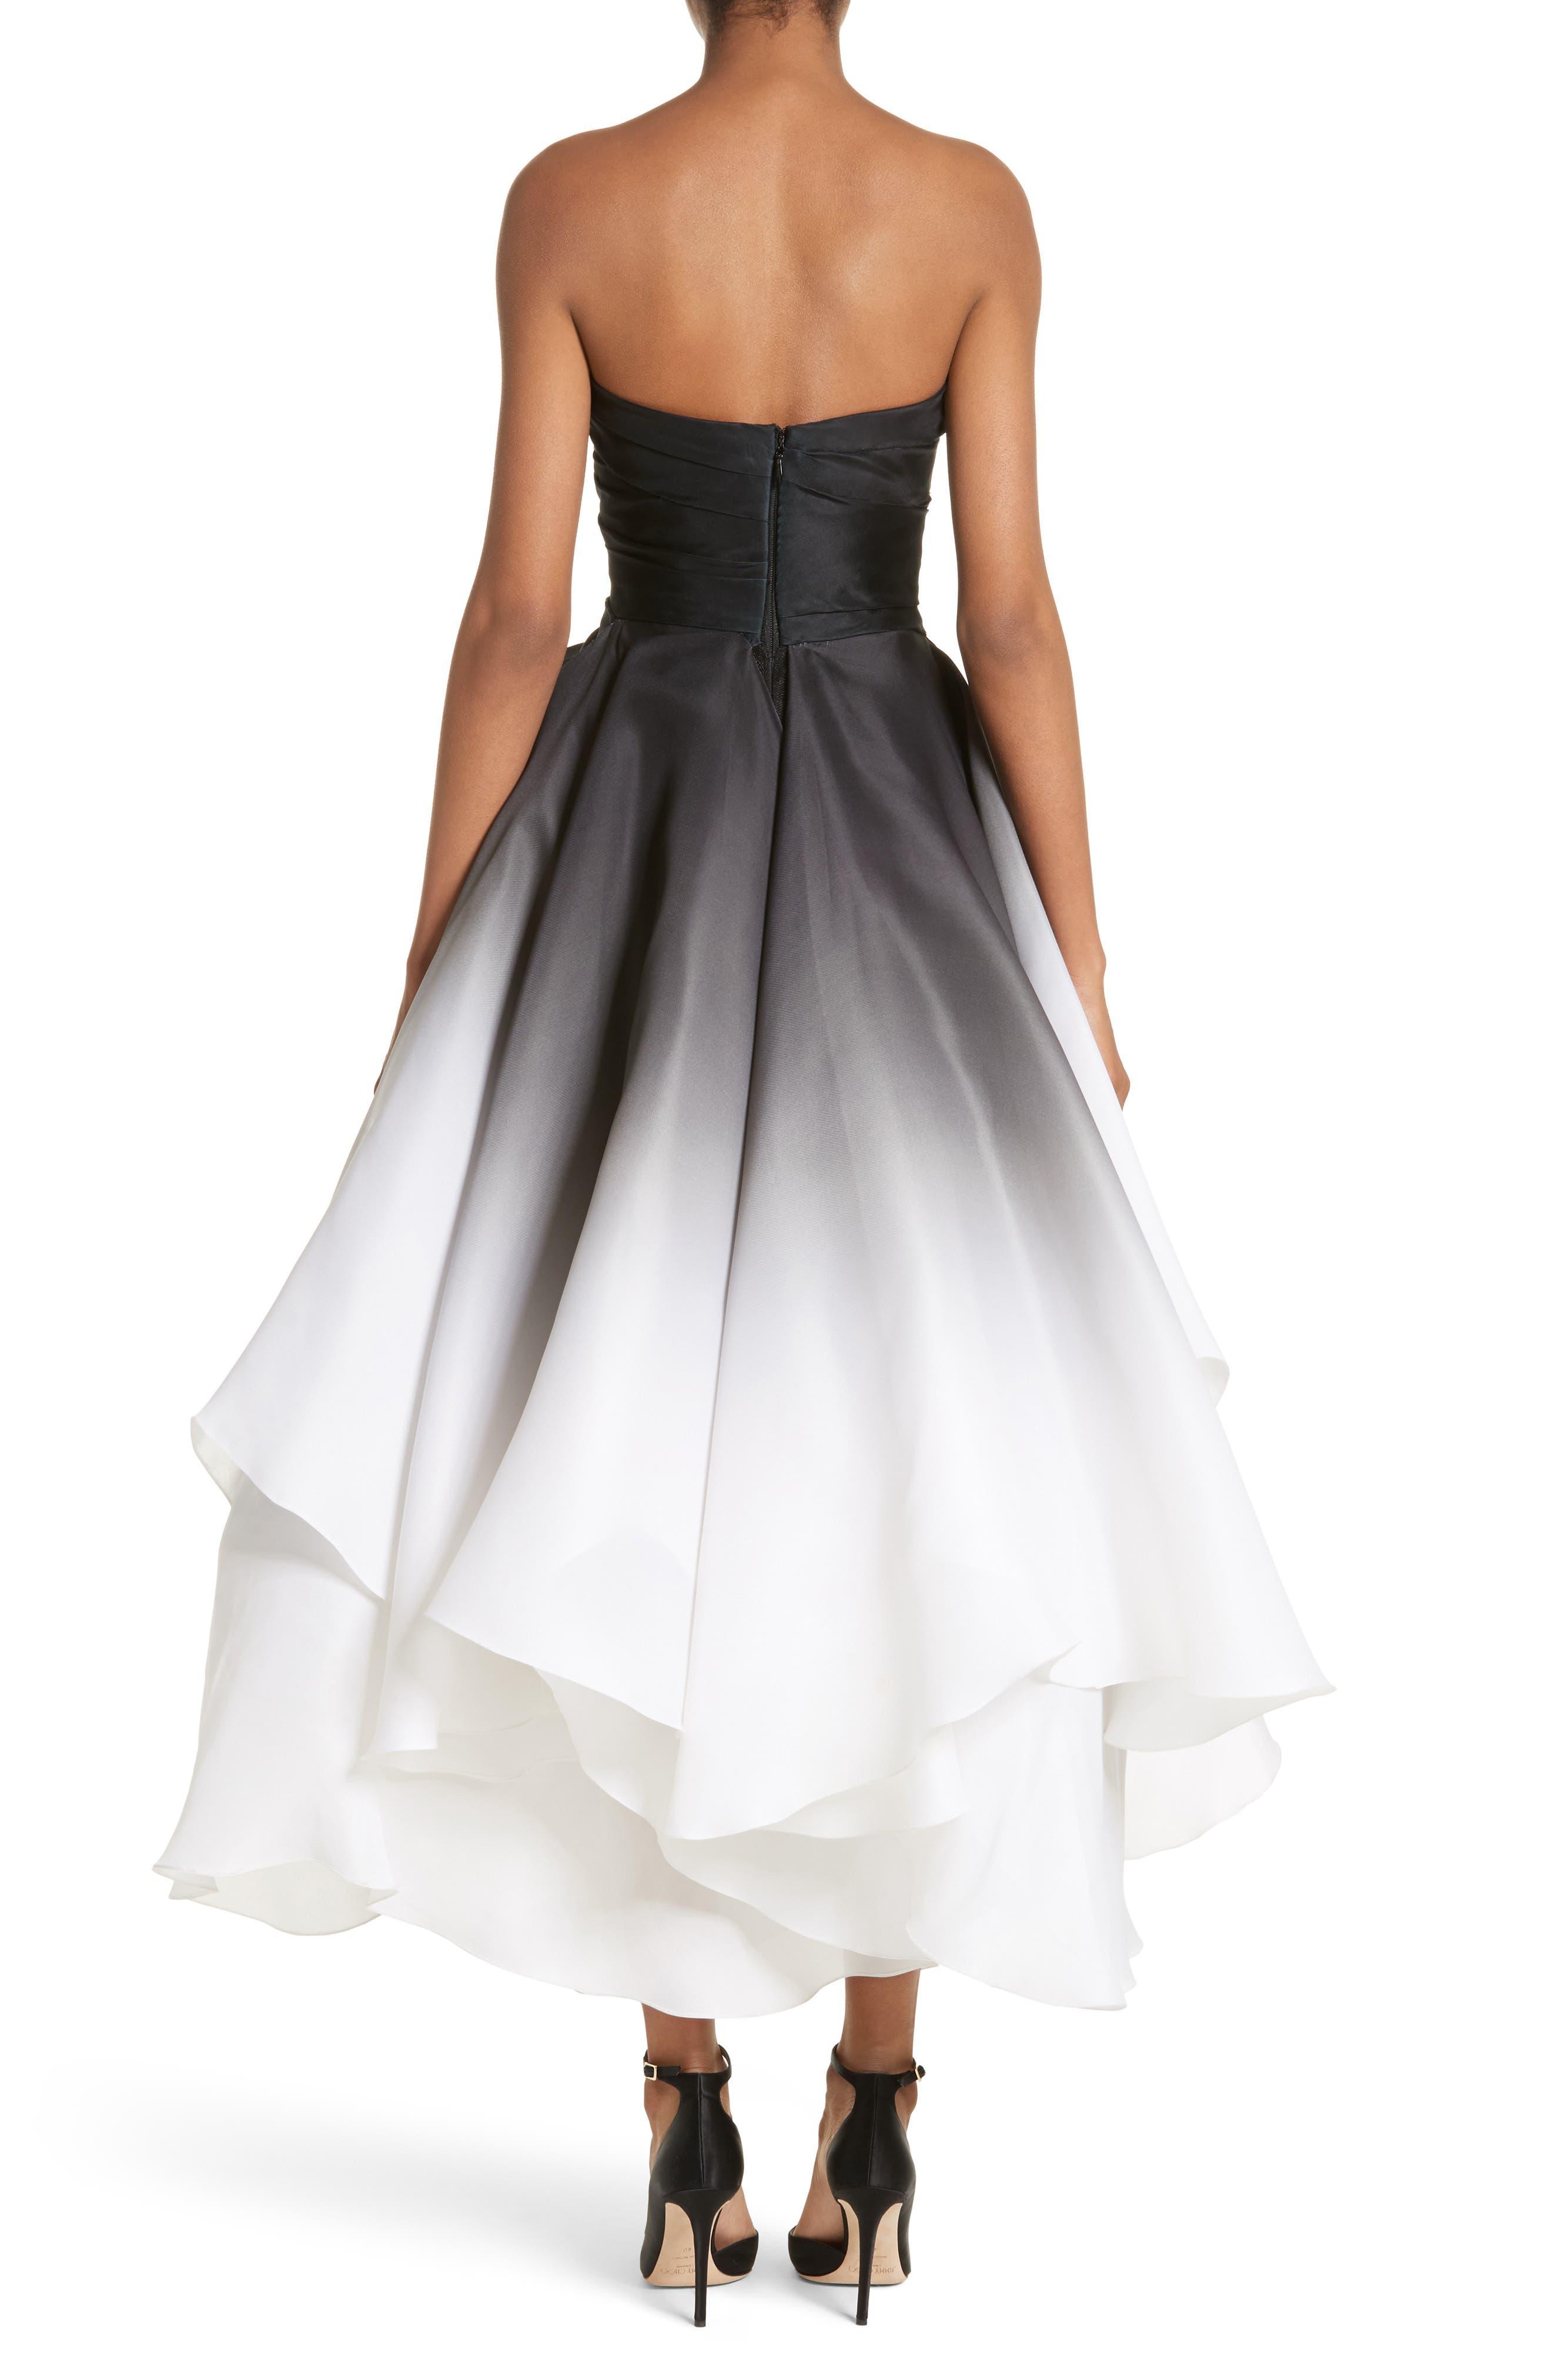 Ombré Strapless Tea Length Dress,                             Alternate thumbnail 2, color,                             001